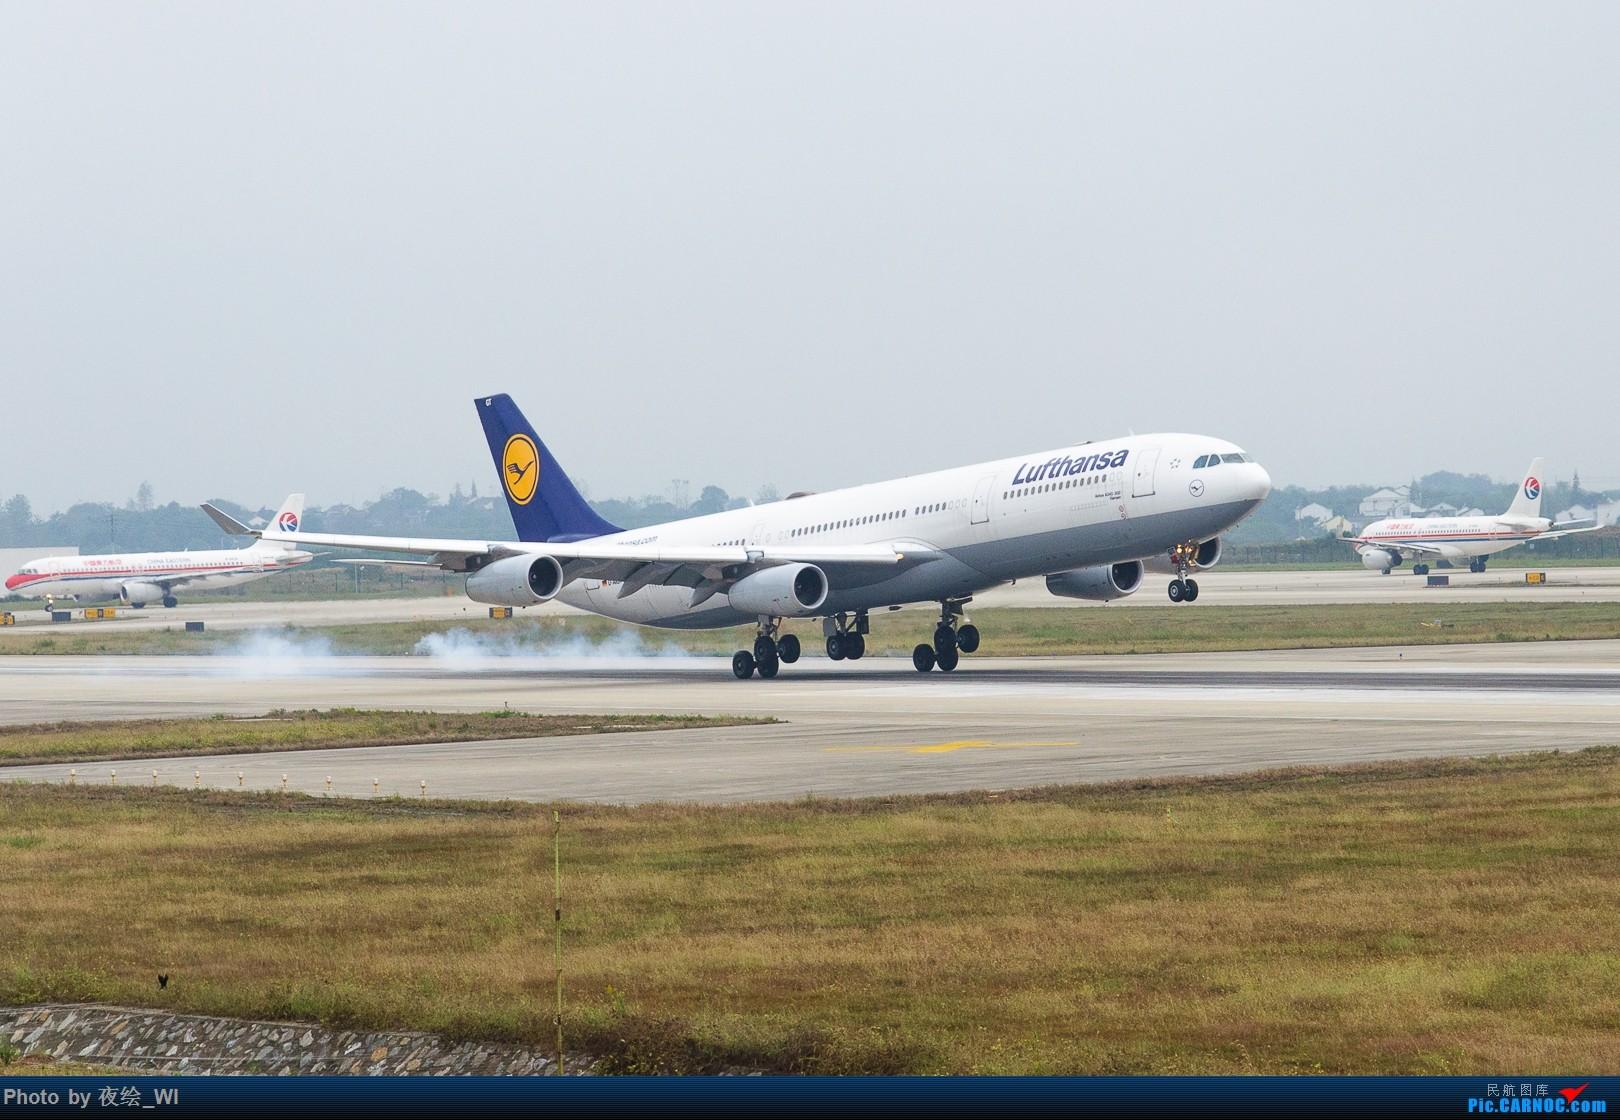 Re:[原创]【NKG】生日也要拍飞机,珍惜南京久违的单跑运行时光 AIRBUS A340-300 D-AIGT 中国南京禄口国际机场